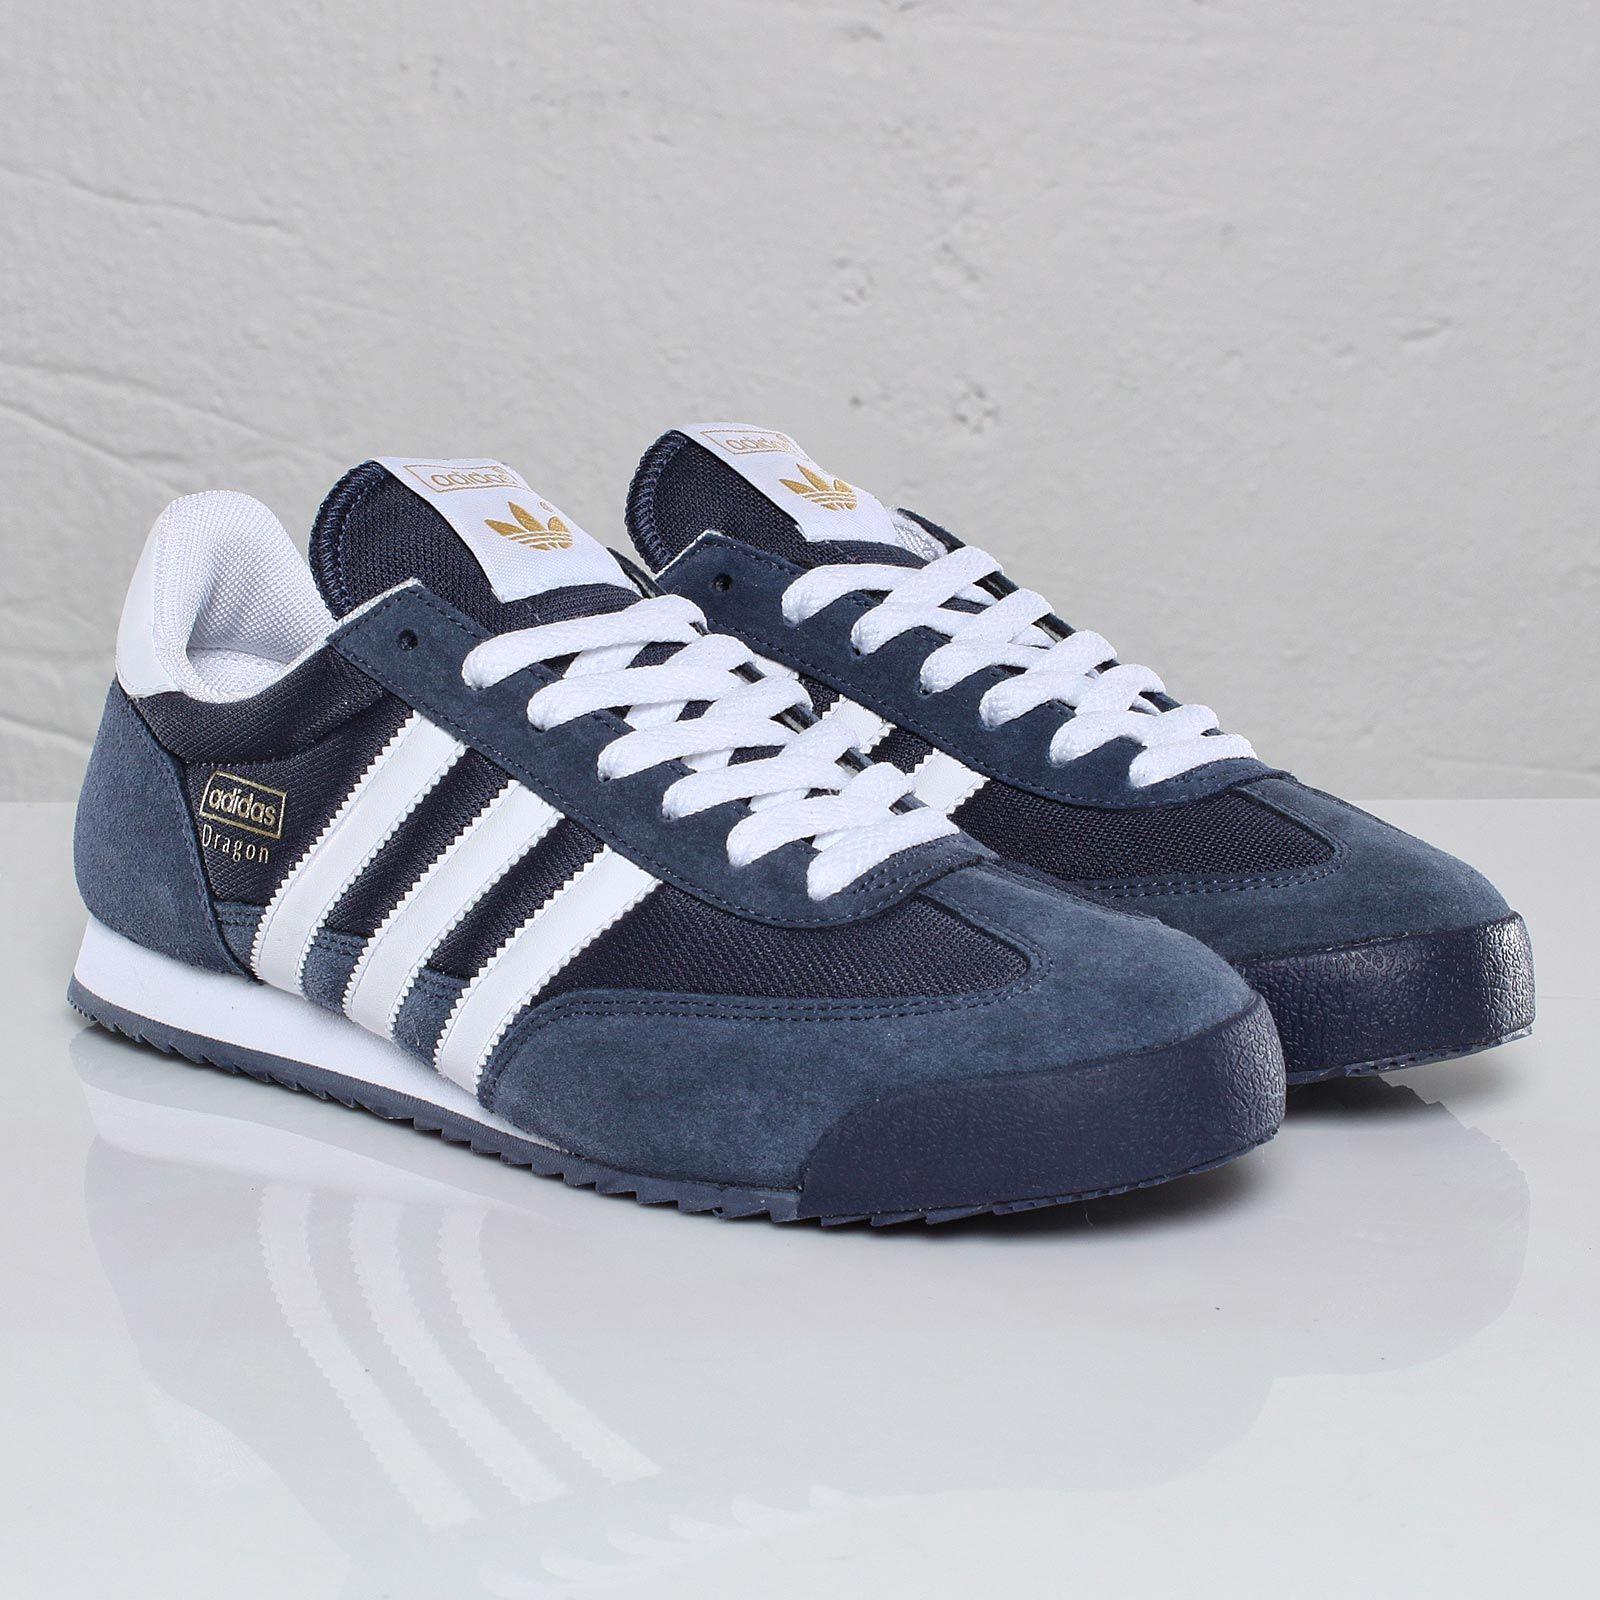 adidas dragon | Streetwear, Sapatos femeninos, Adidas